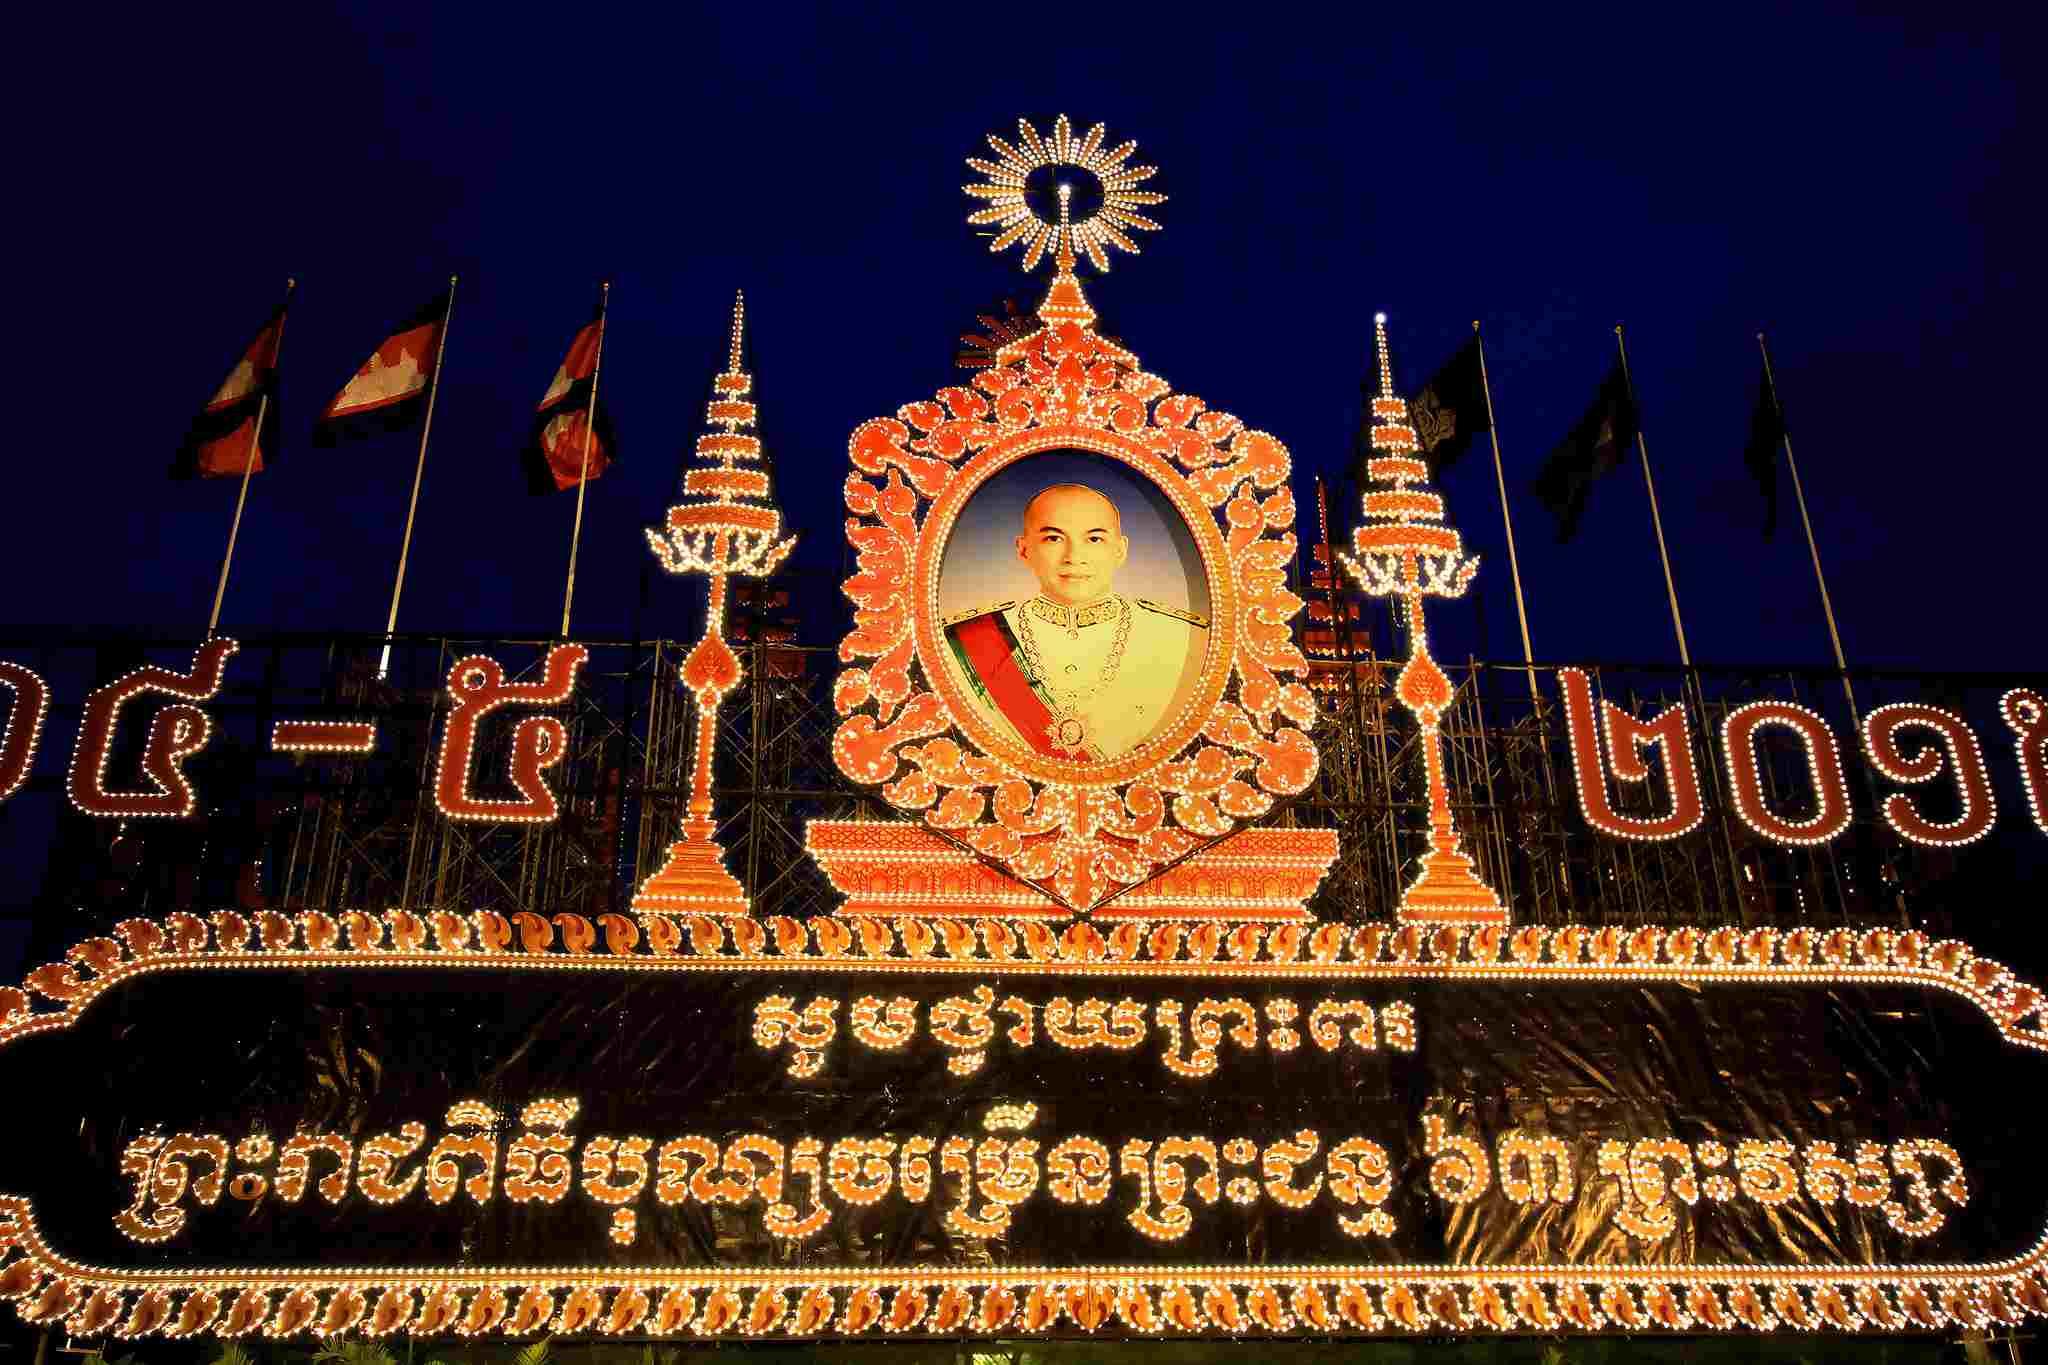 King Sihamoni's portrait in Phnom Penh, Cambodia